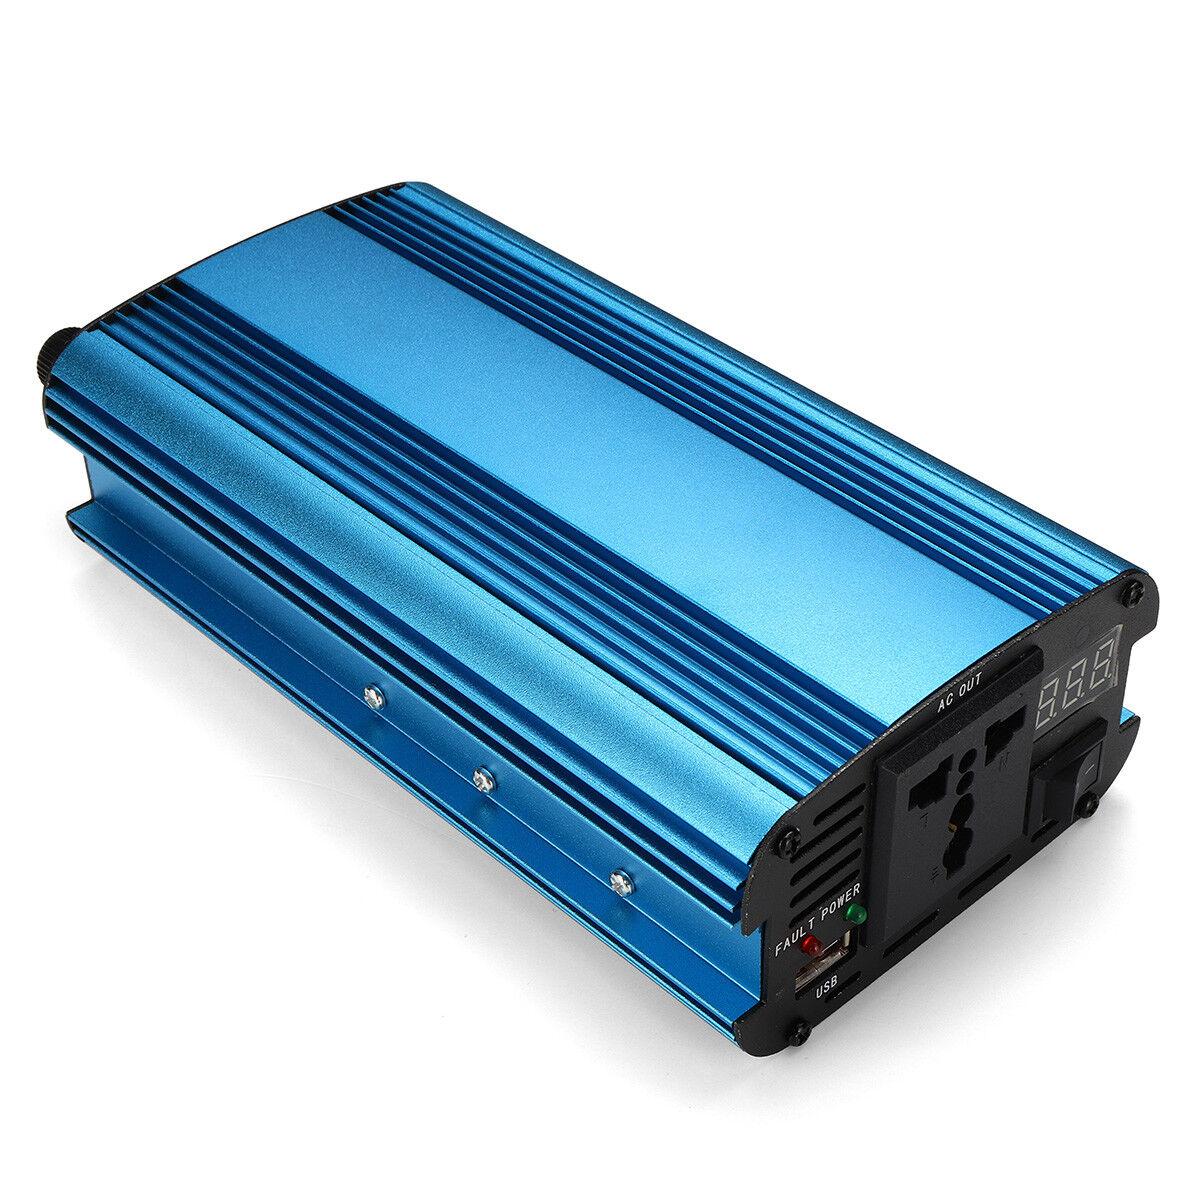 Solar Power Inverter 5000w Led 12v  24v Dc To 110v  220v Ac